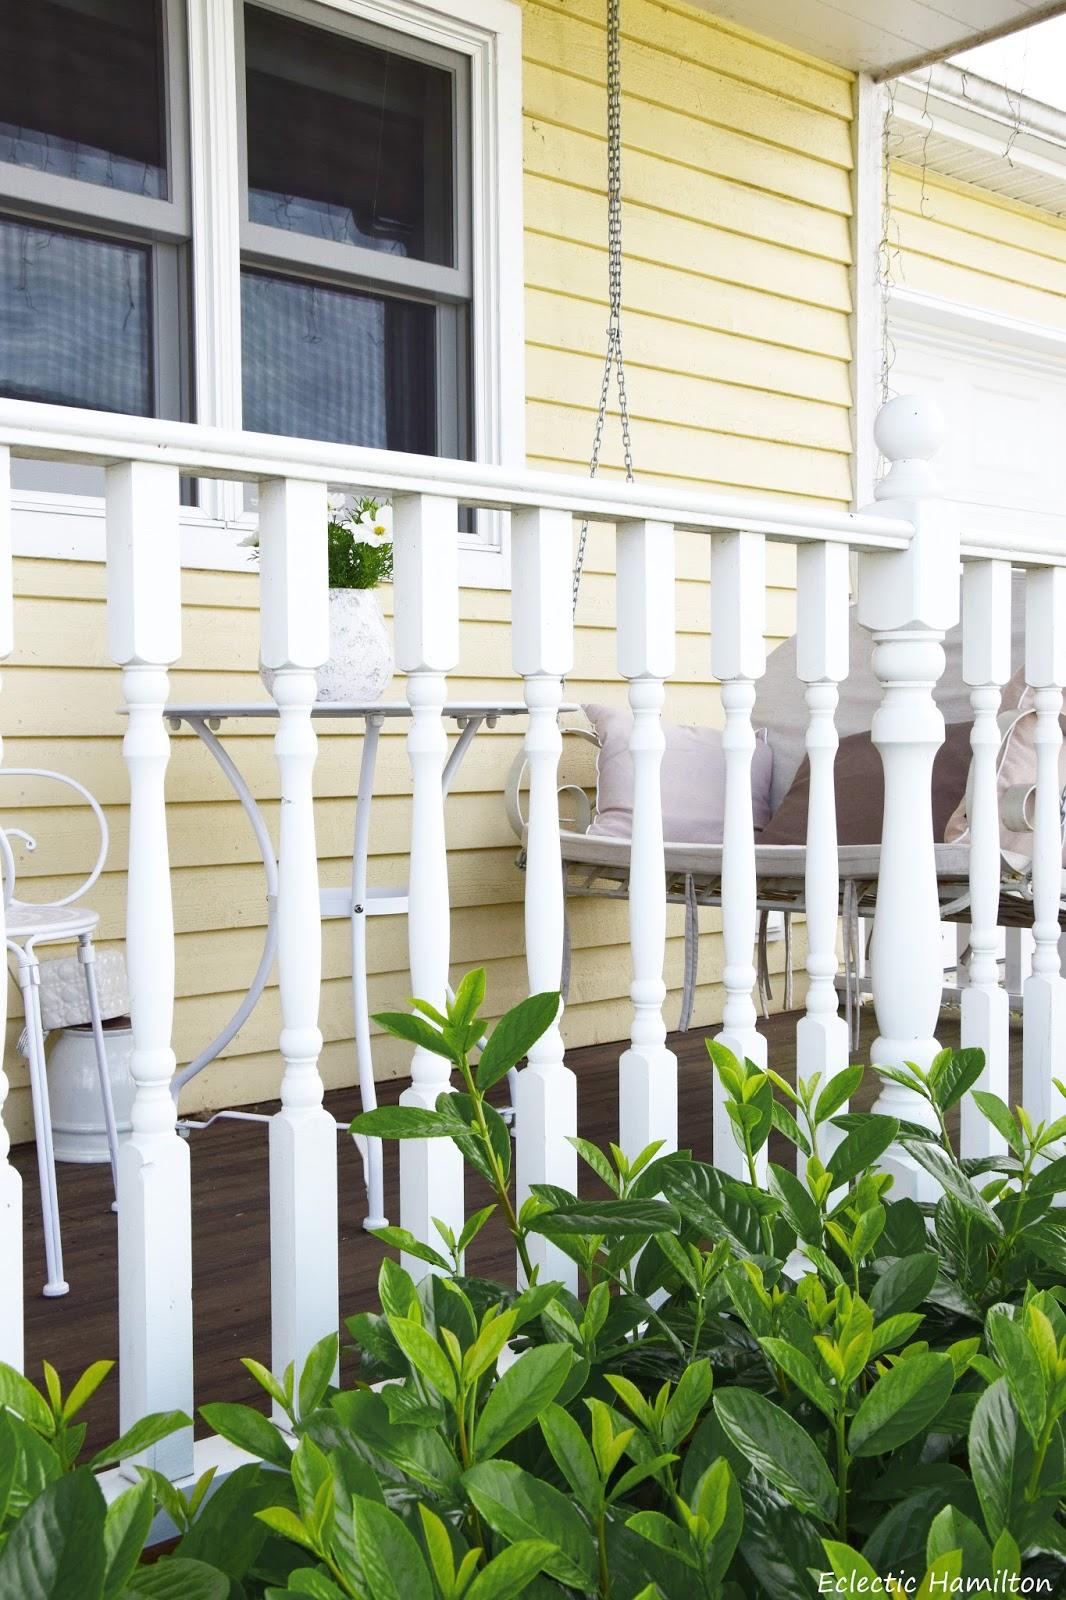 Amerikanische Veranda amerikanische veranda stühle dekoration ideen